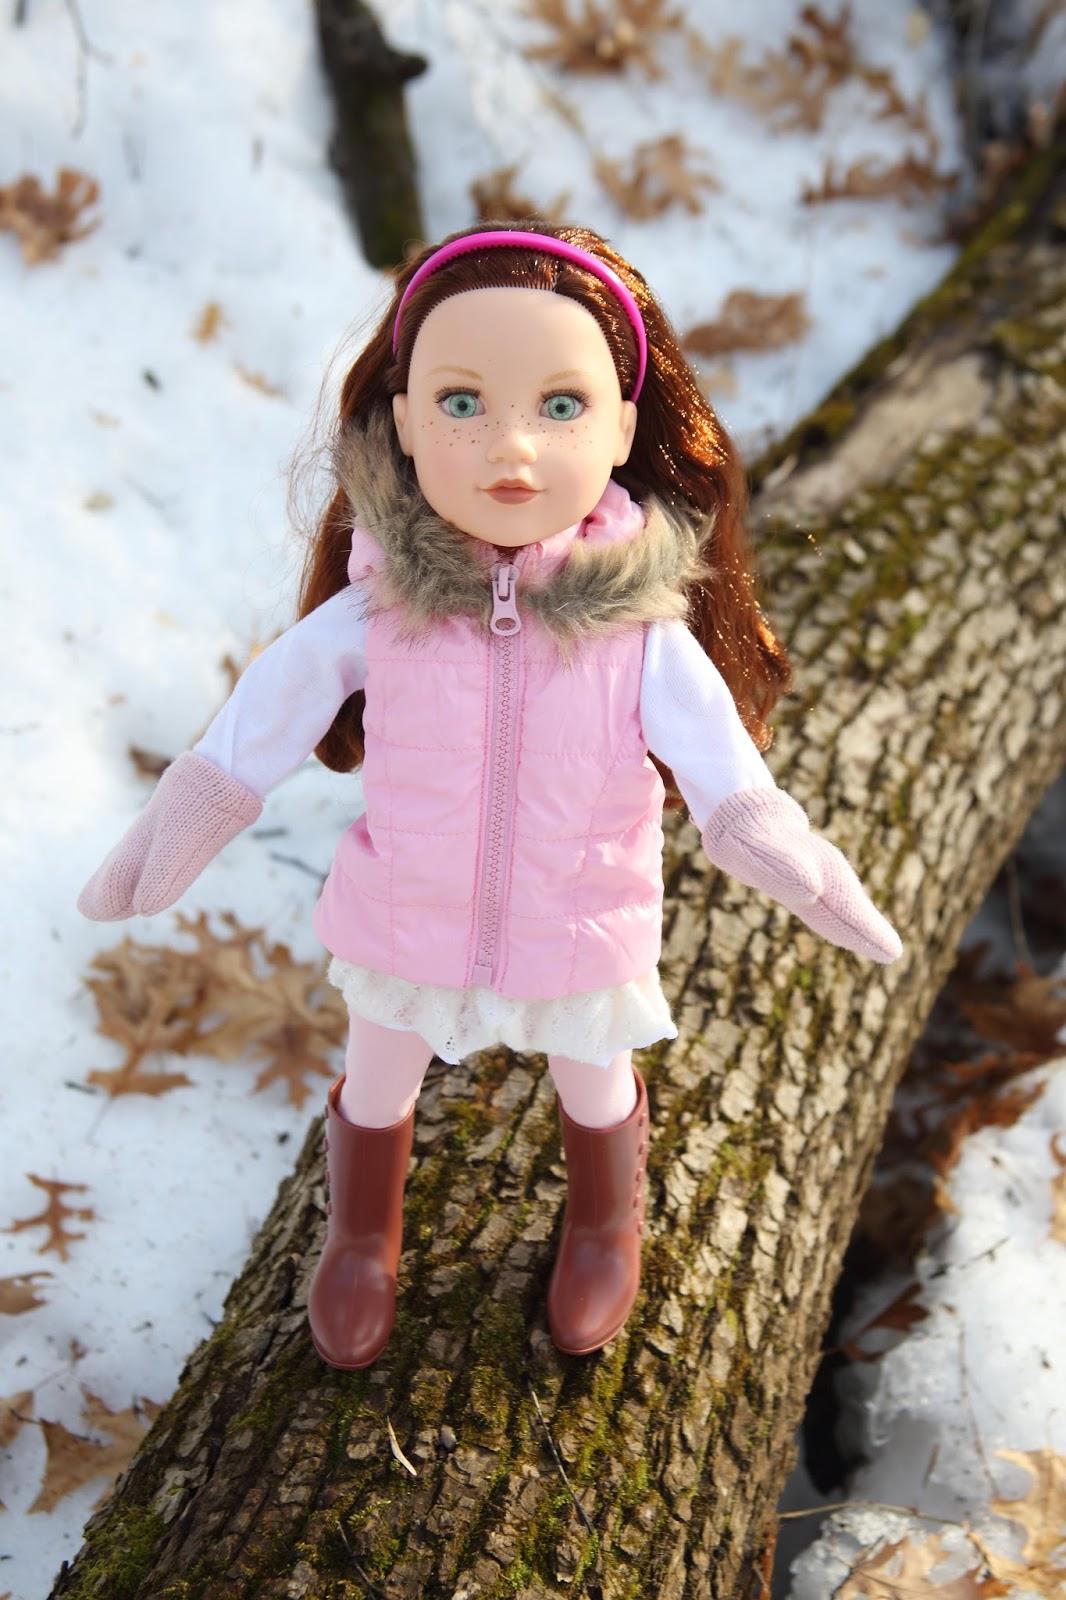 my journey girls dolls adventures journey girls kelseys